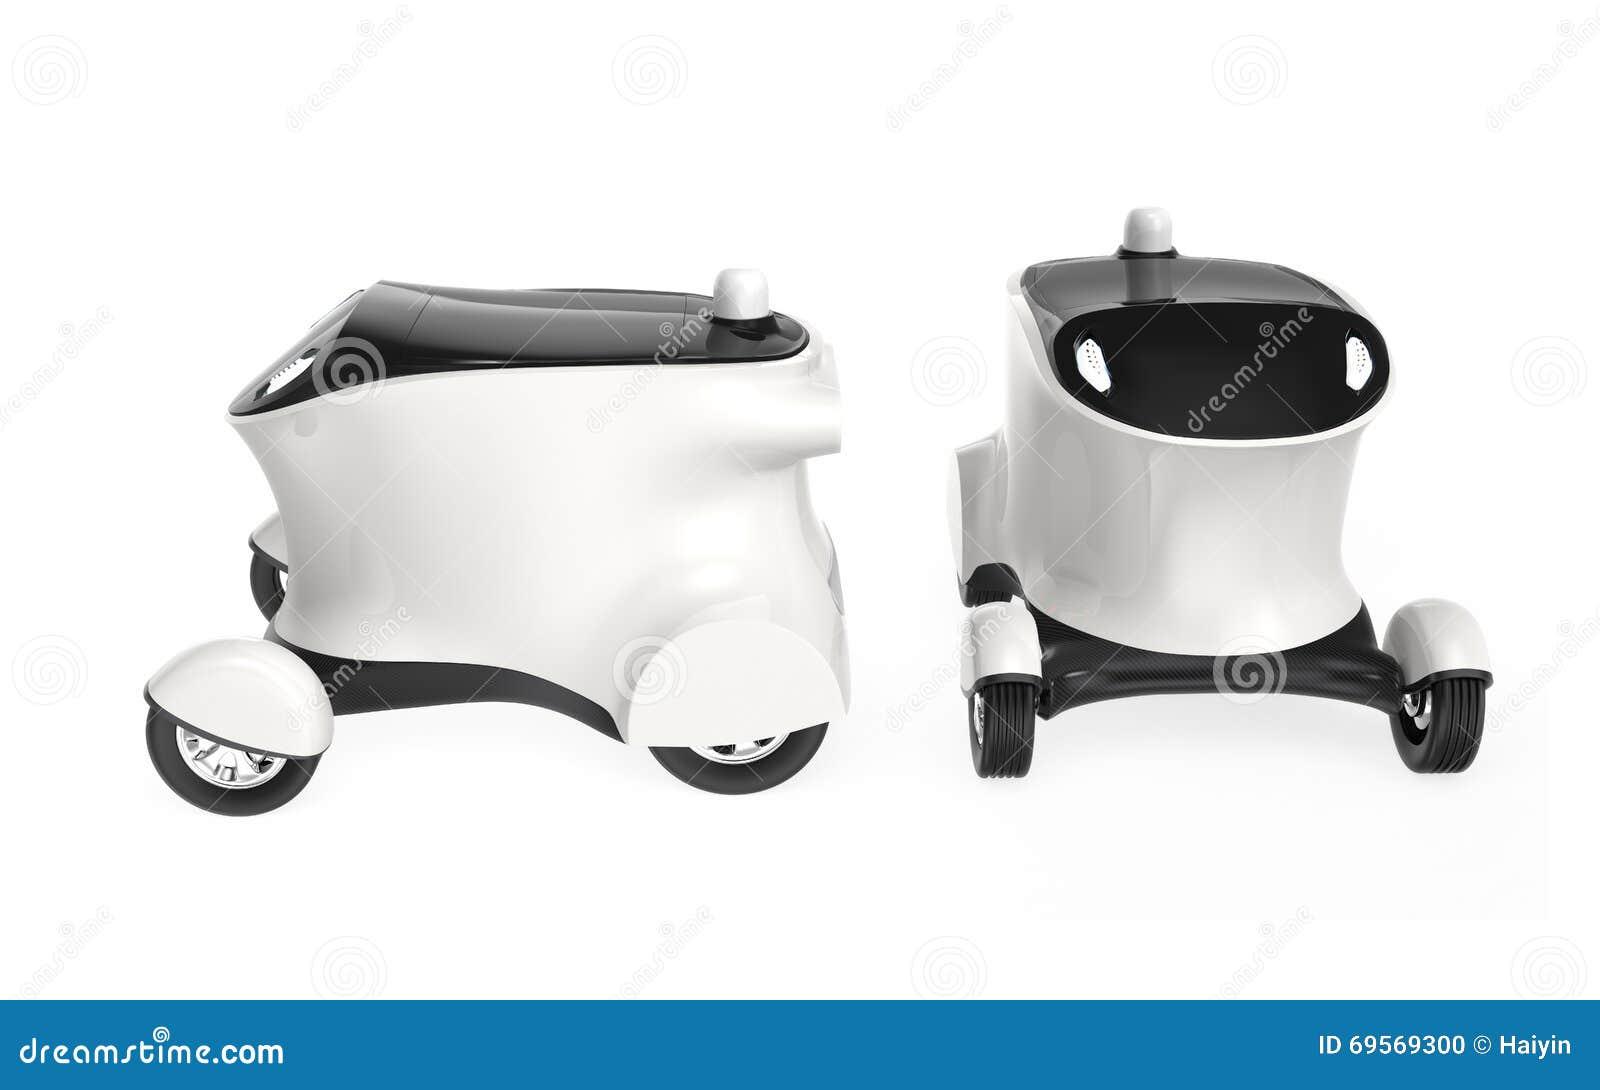 Concept car design driving the dream pdf